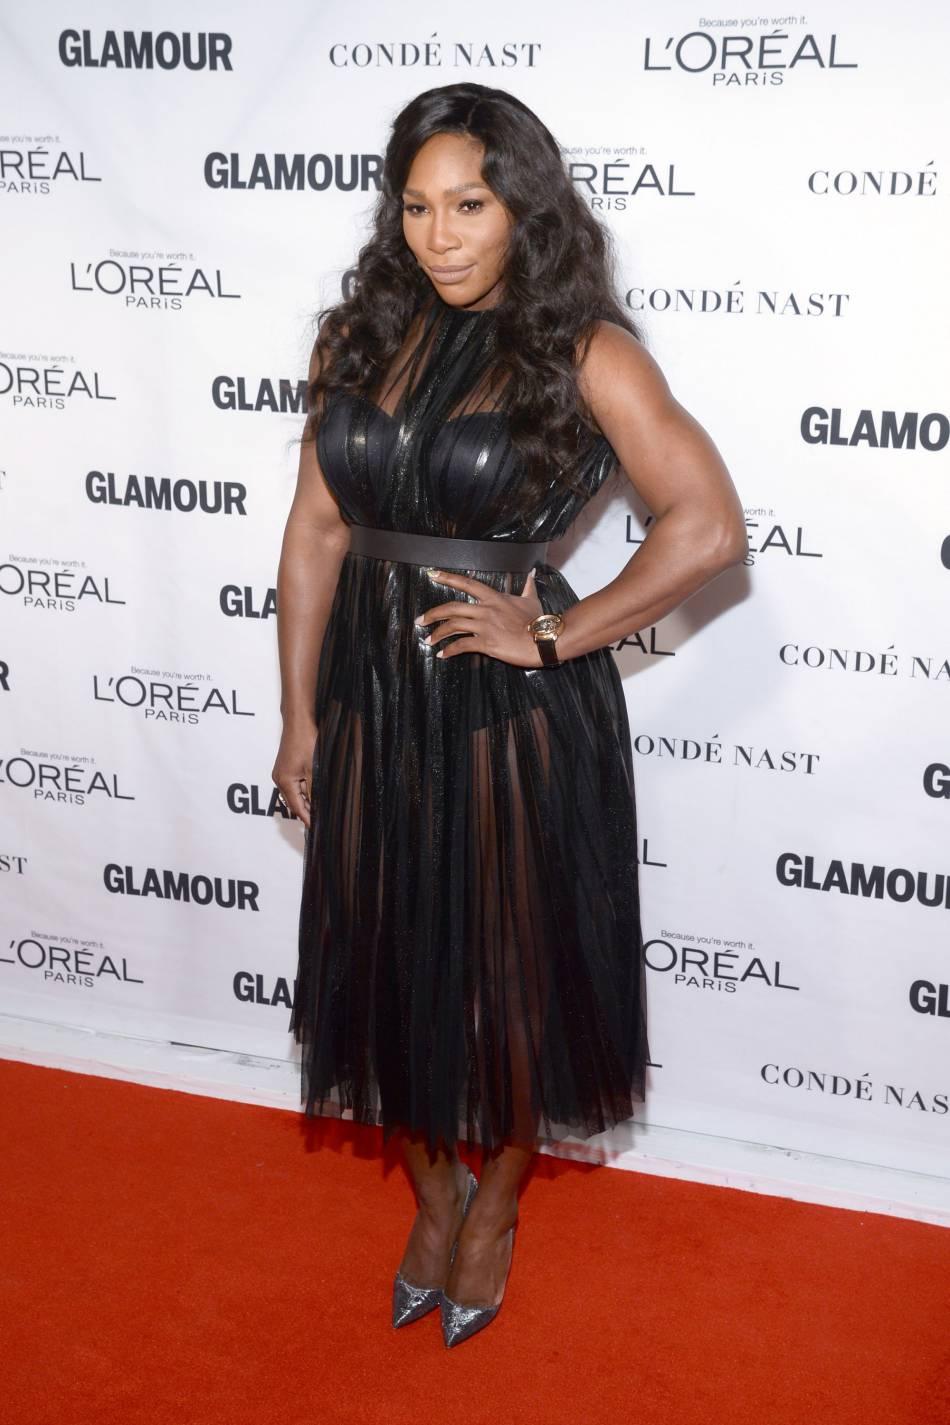 Serena Williams aux Glamour Awards le 9 novembre 2015 à New York.